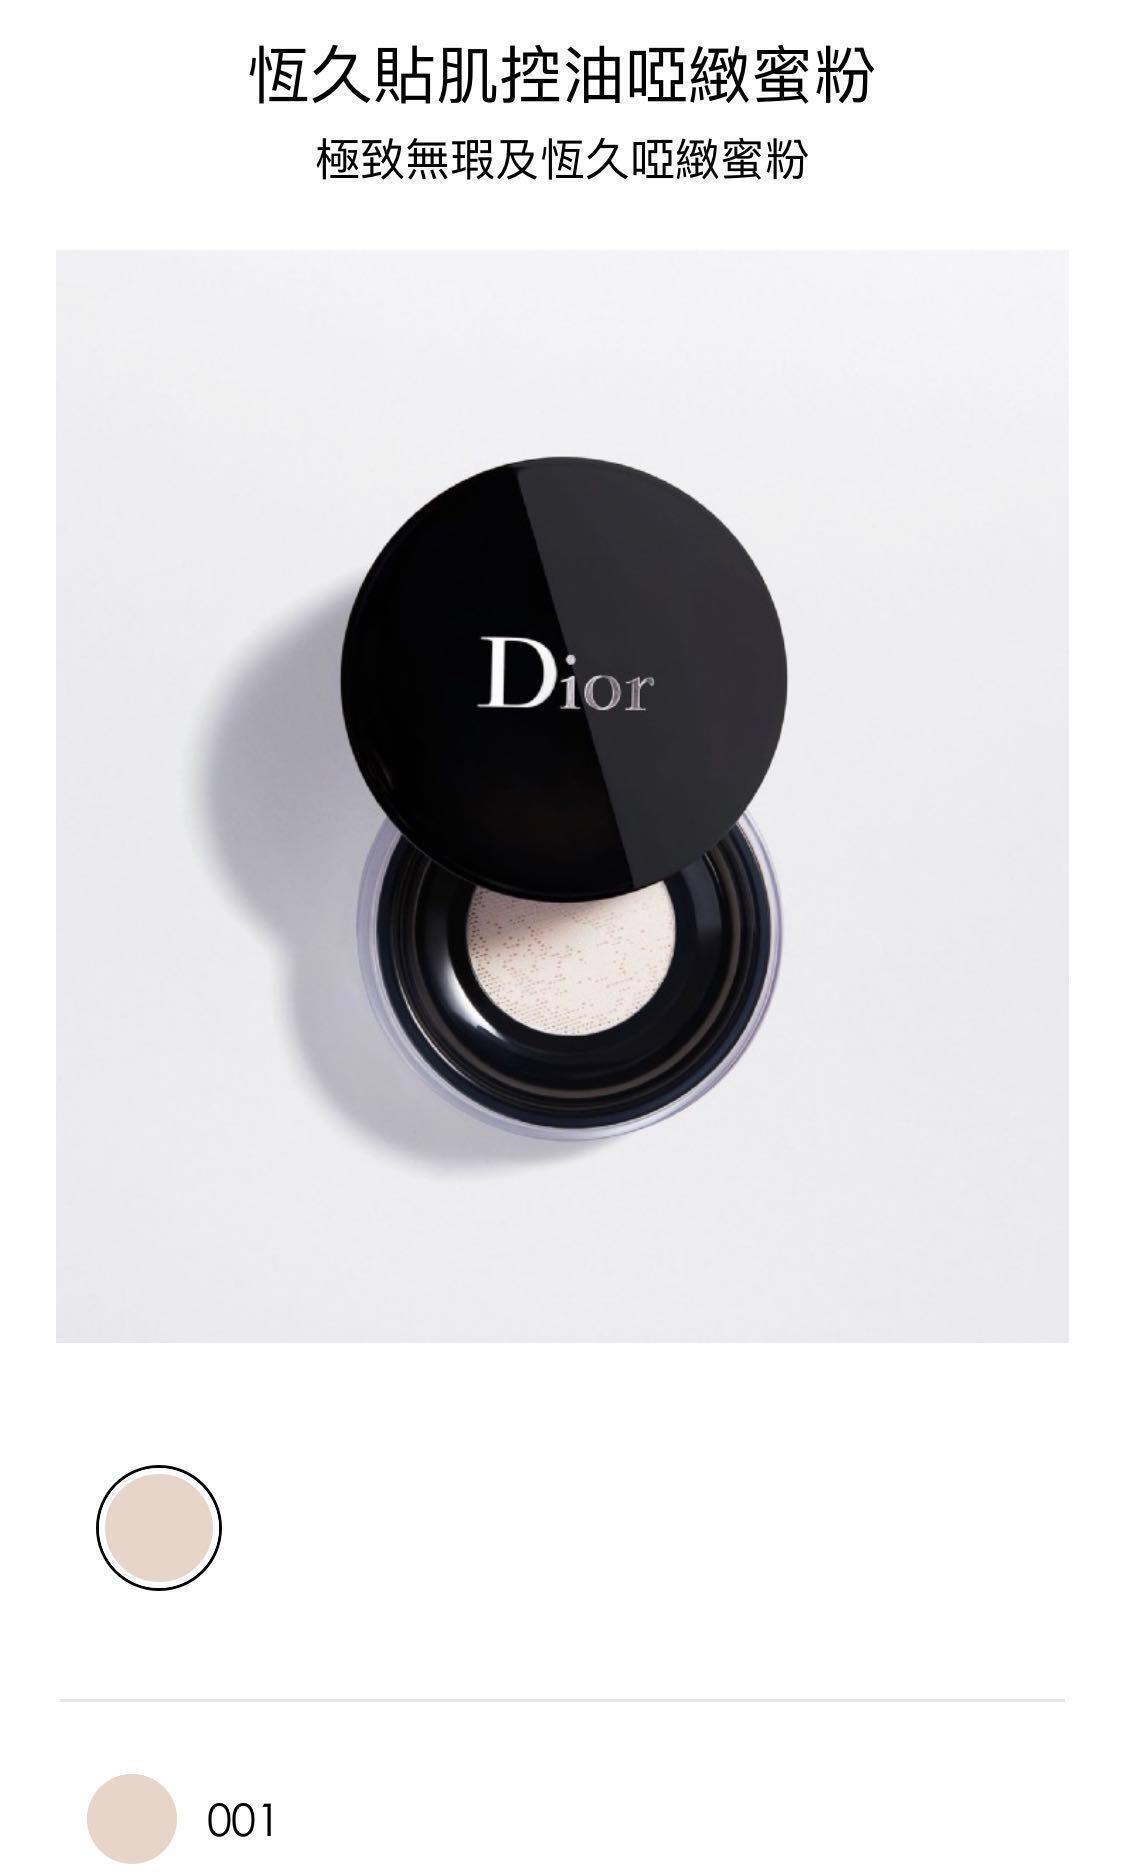 Dior Skin Forever & Ever Control 碎粉